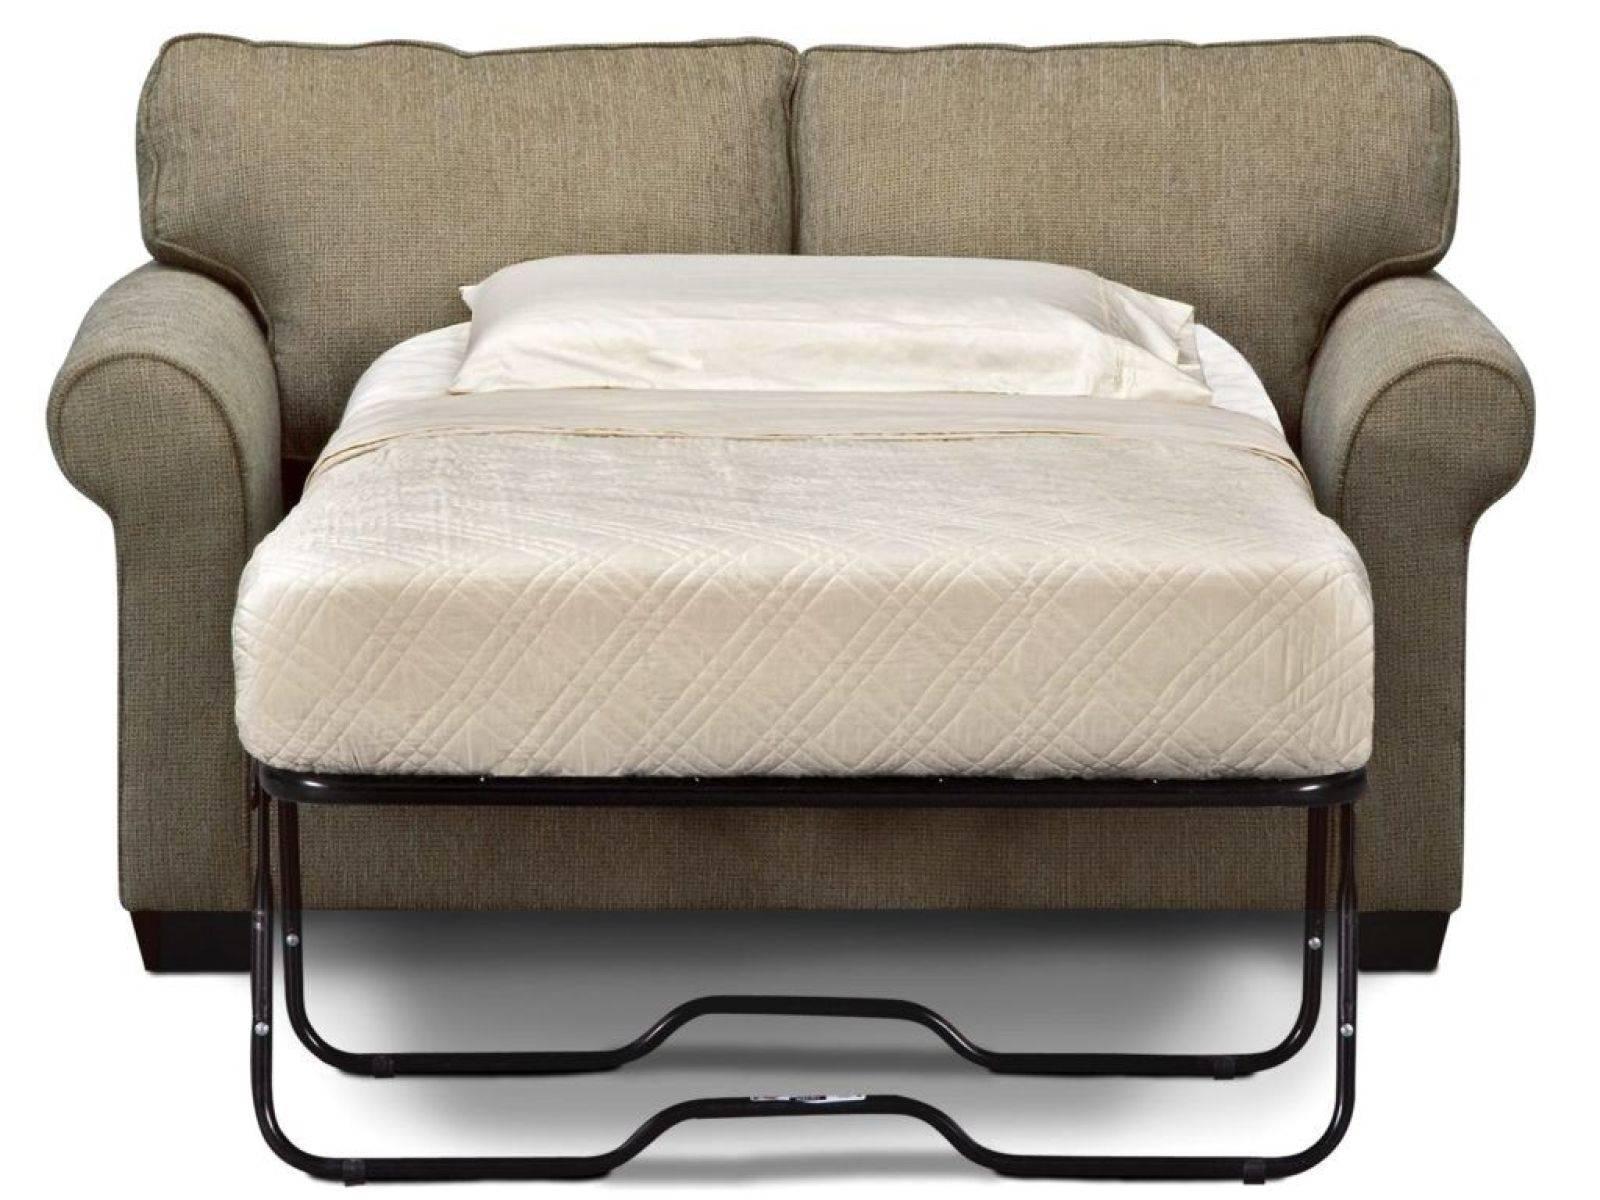 ▻ Sofa : 37 Elegant King Size Sofa Sleeper Coolest Home Furniture Regarding King Size Sofa Beds (View 12 of 15)